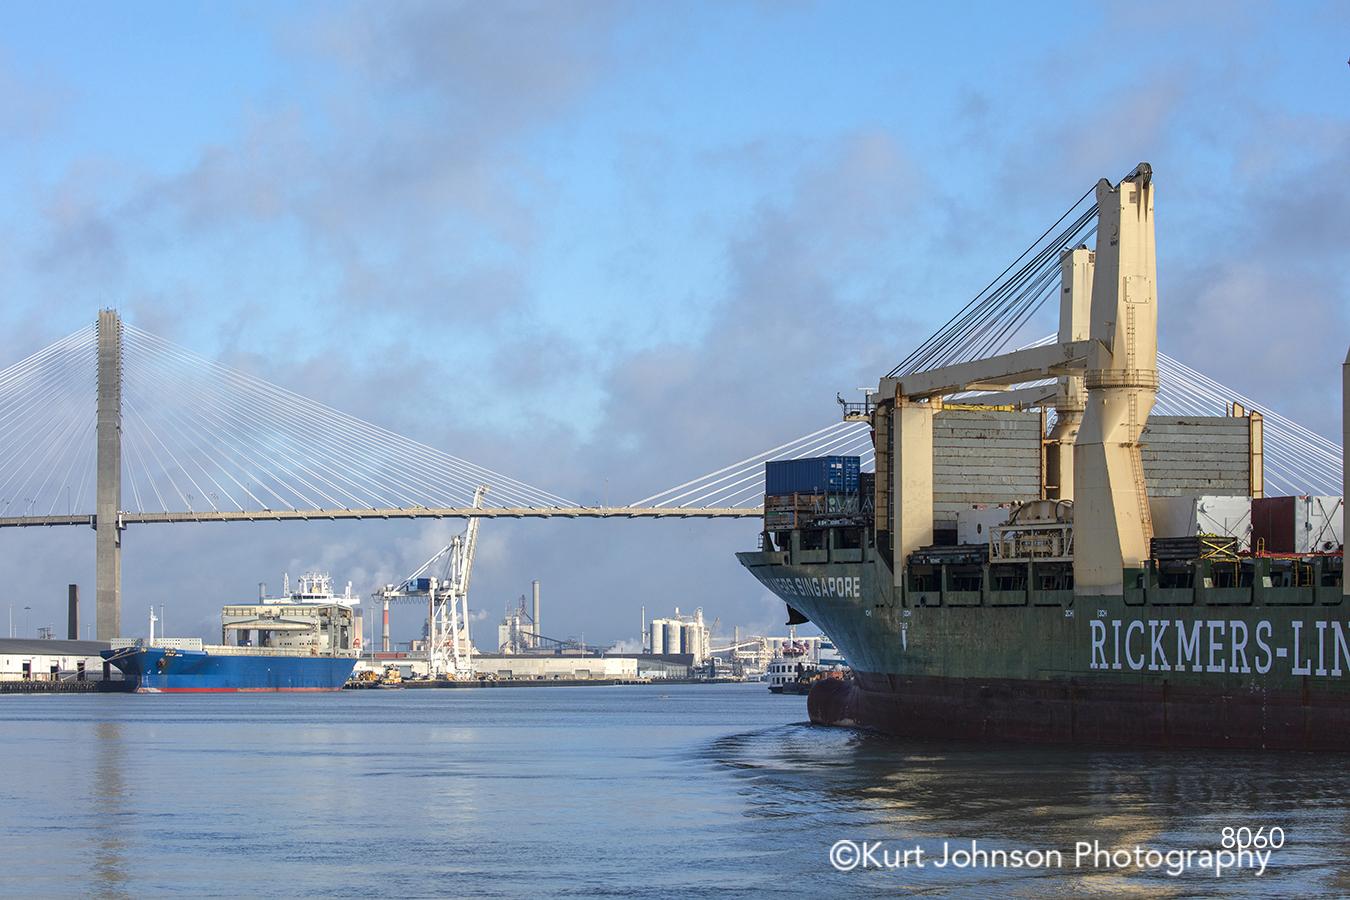 boat ship vessel ocean water waterscape blue sky clouds reflection south southeast